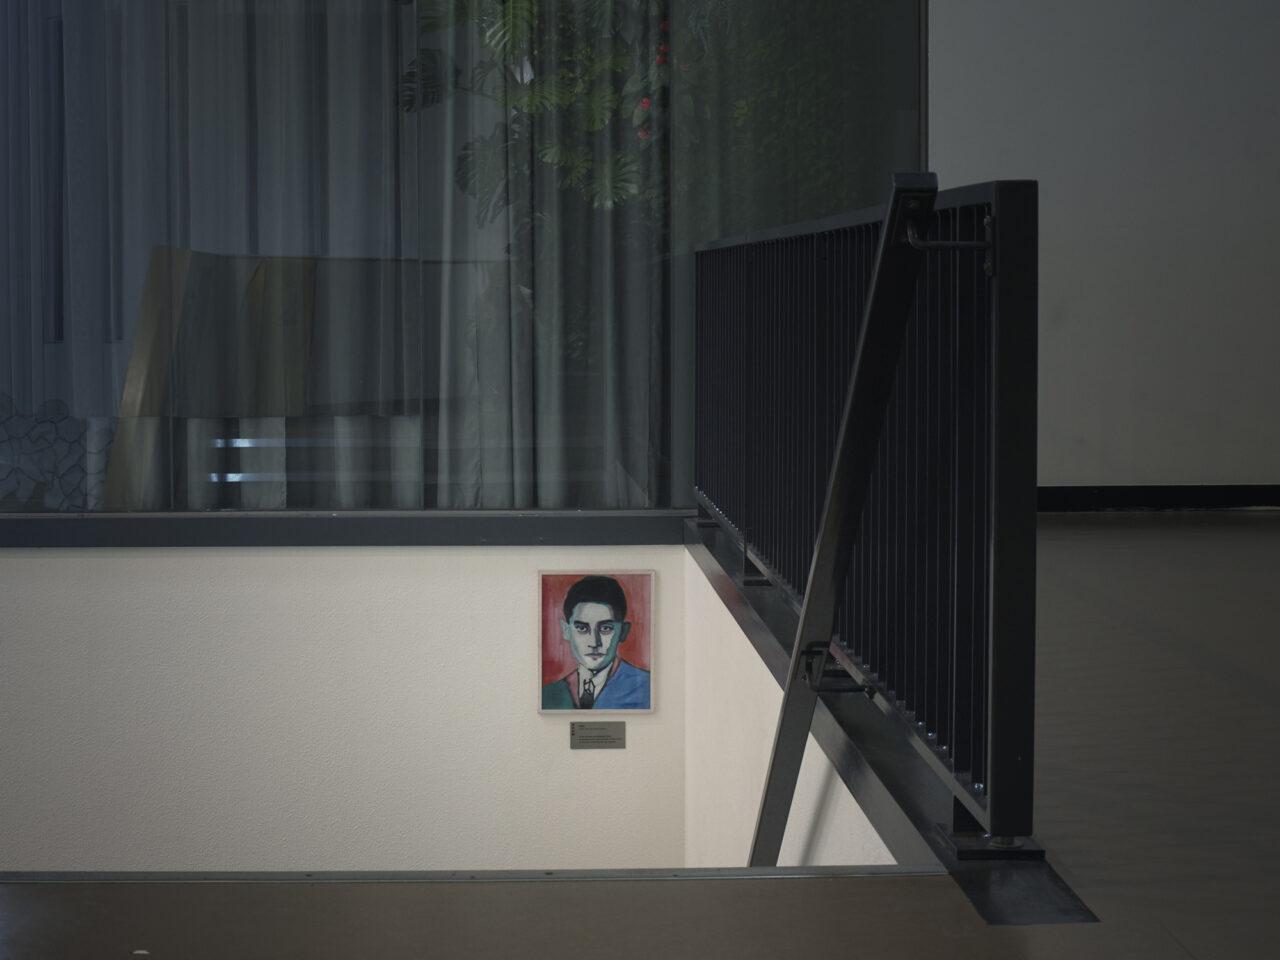 Portret van Kafka, Stadsdeelkantoor, Amsterdam